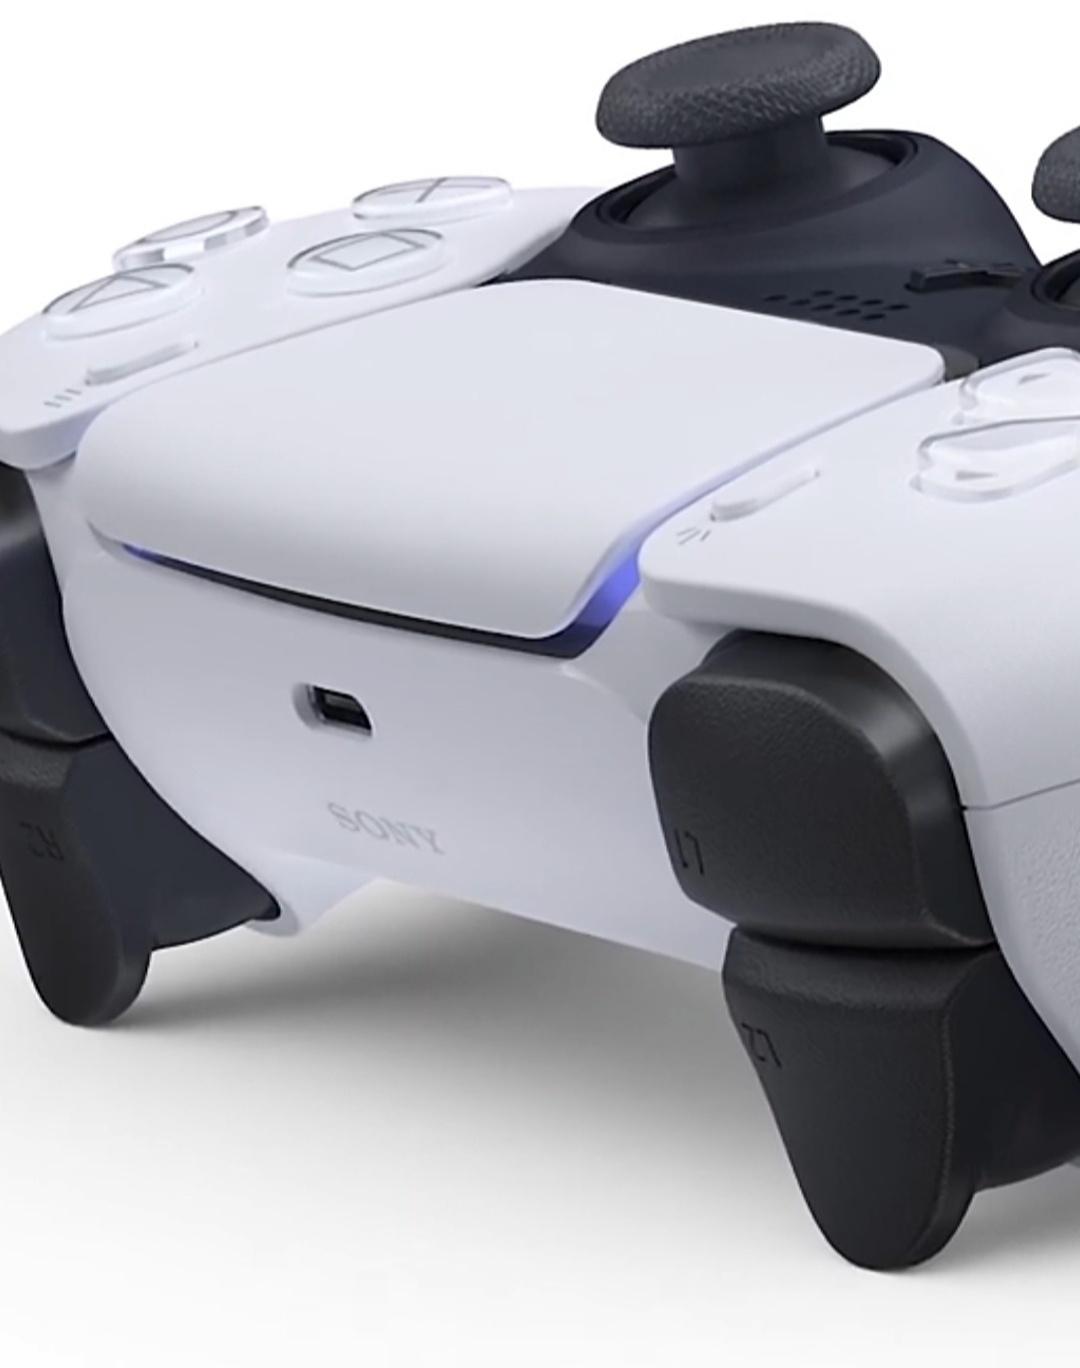 DualSense 5 Features, PS5 Controller Features